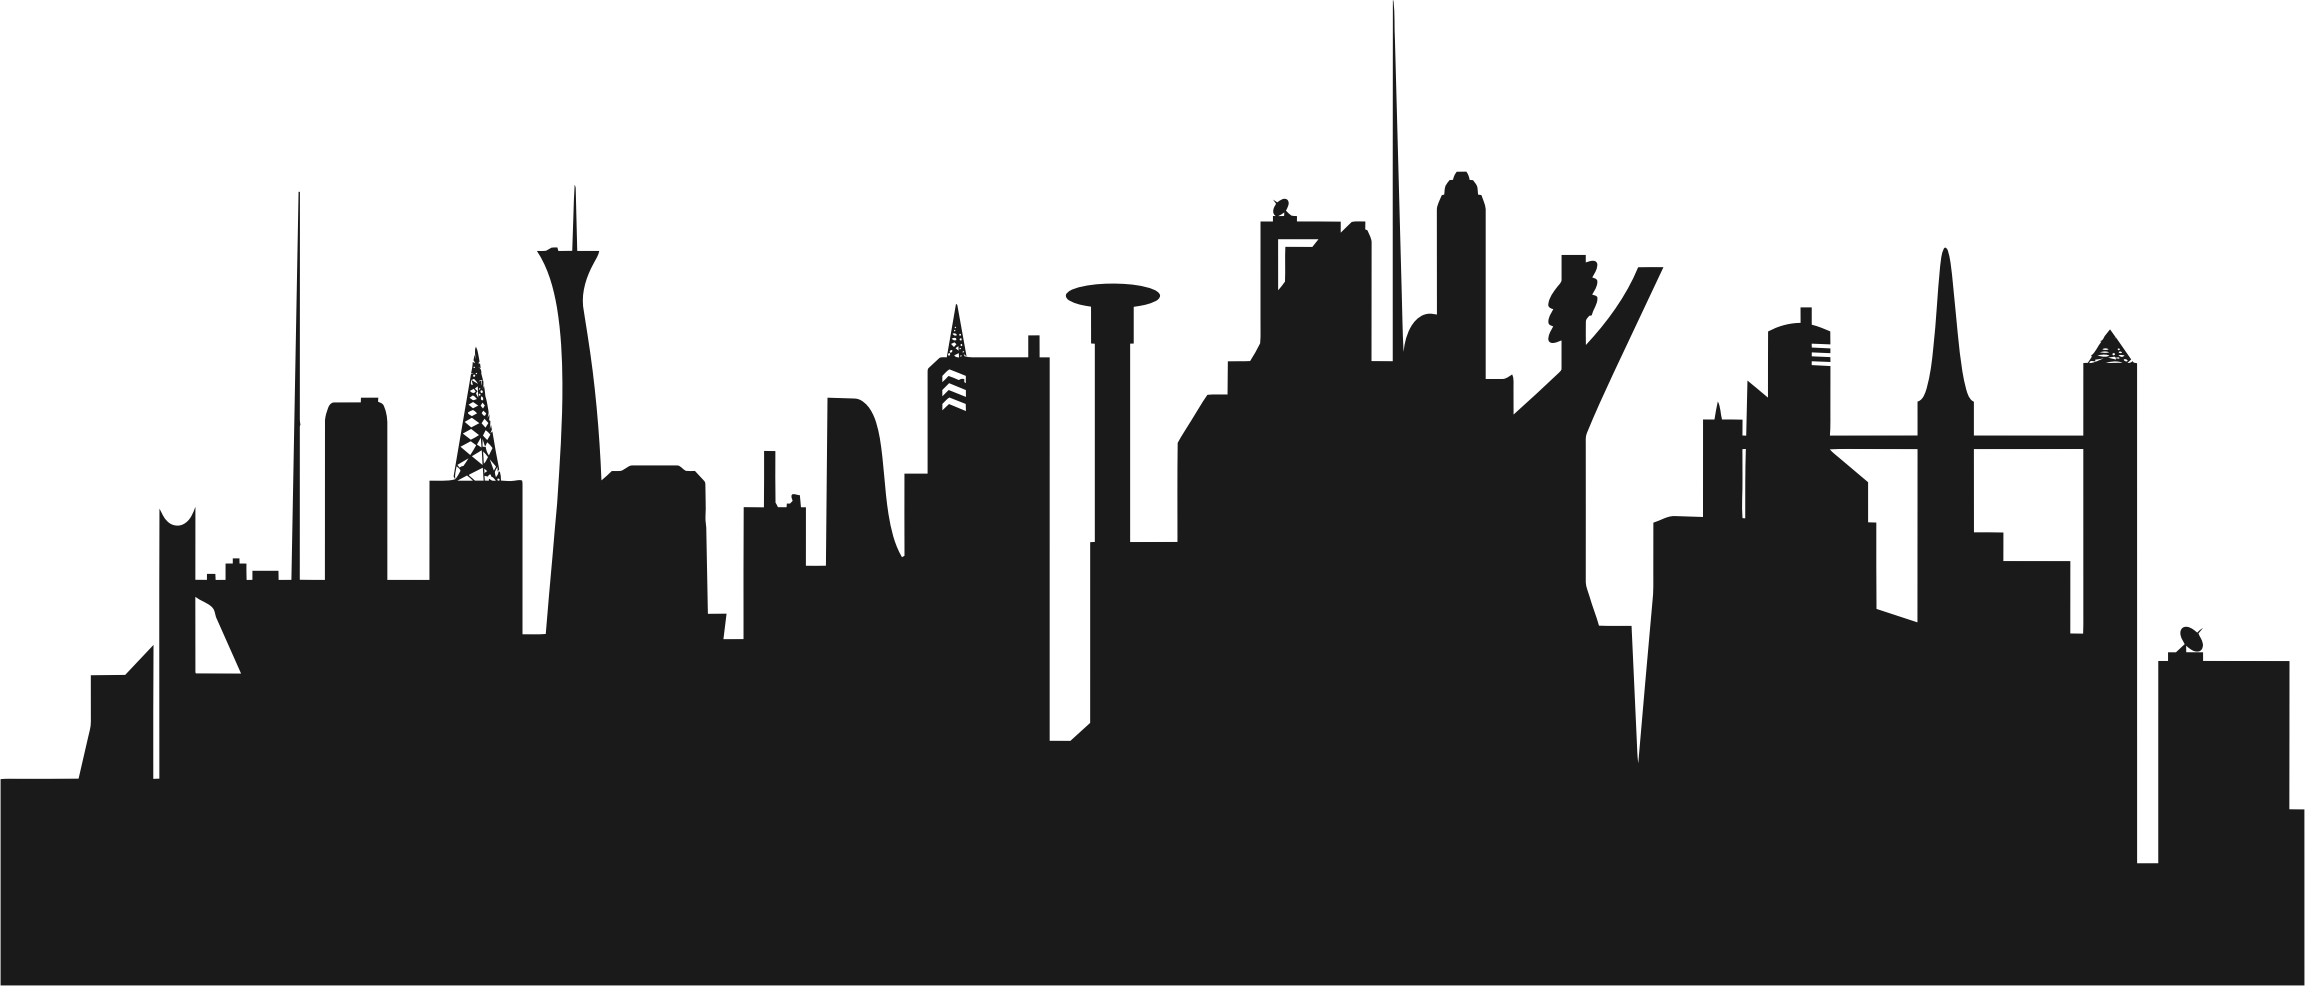 new york skyline silhouette vector at getdrawings com free for rh getdrawings com new york city clipart images new york city skyline clipart free